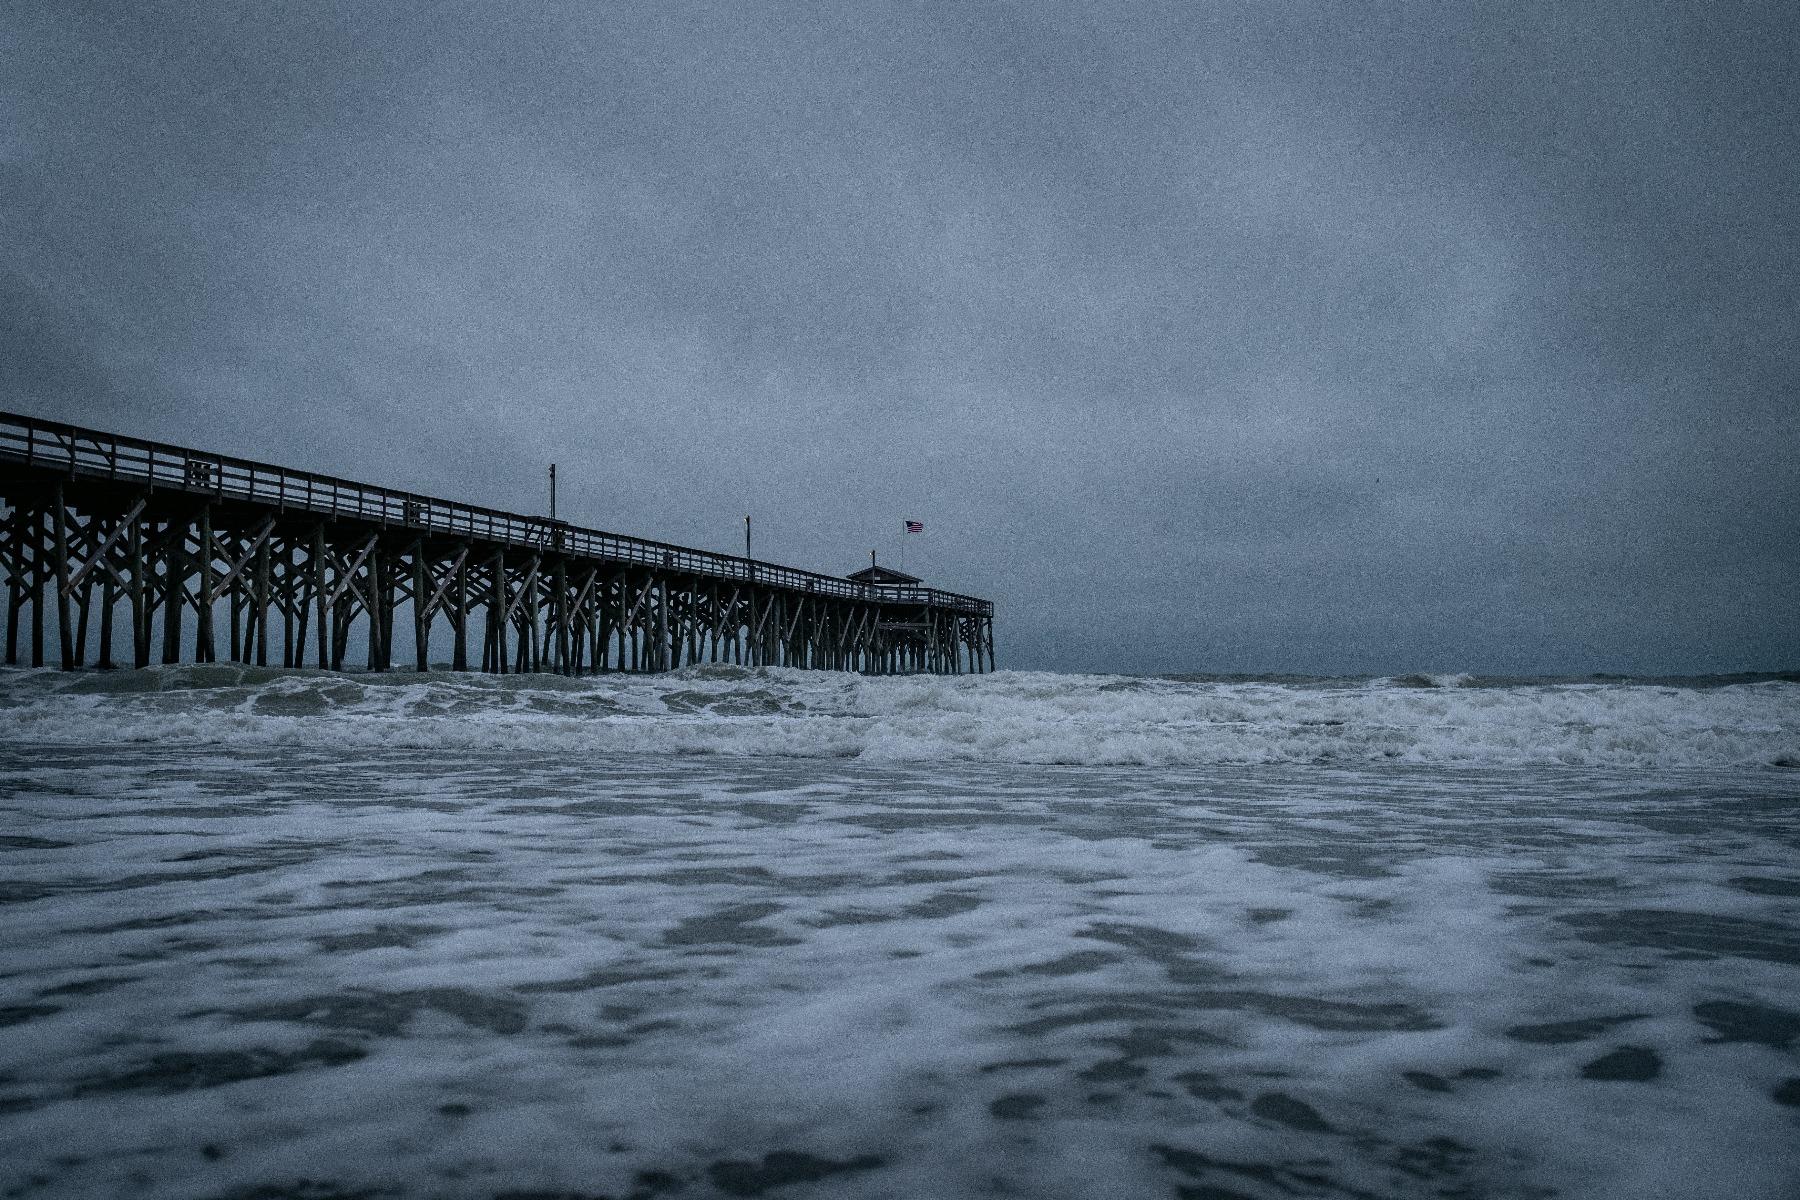 dark stormy sky and sea surrounding long pier extending into ocean